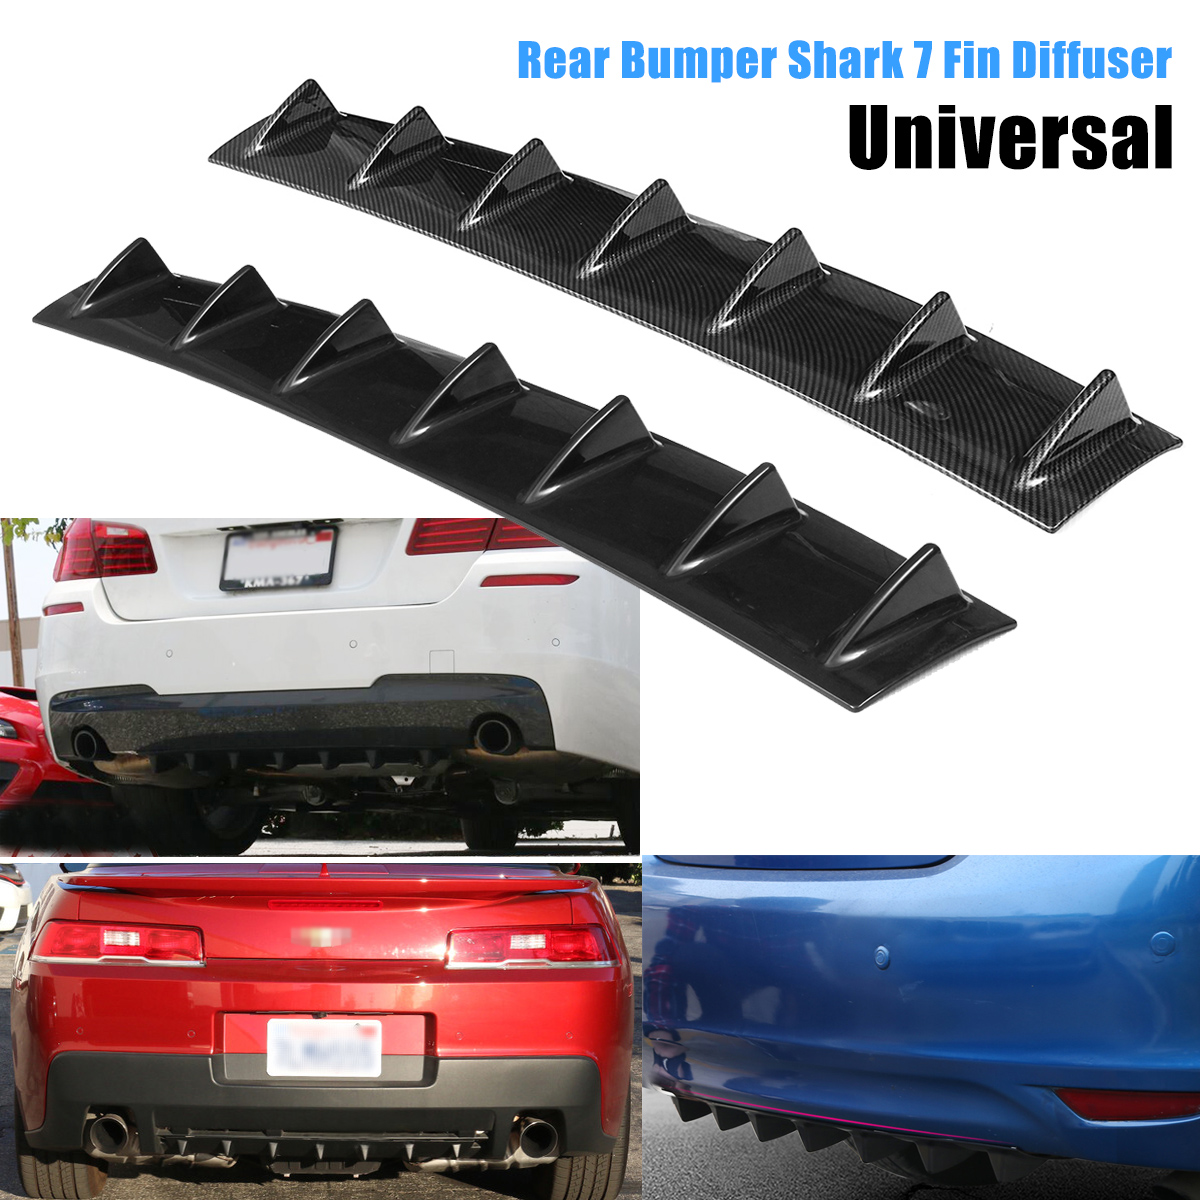 Universal 33 X 5 ABS Car Rear Bumper Shark Fin 7 Wings Lip Diffuser Spoiler Kit